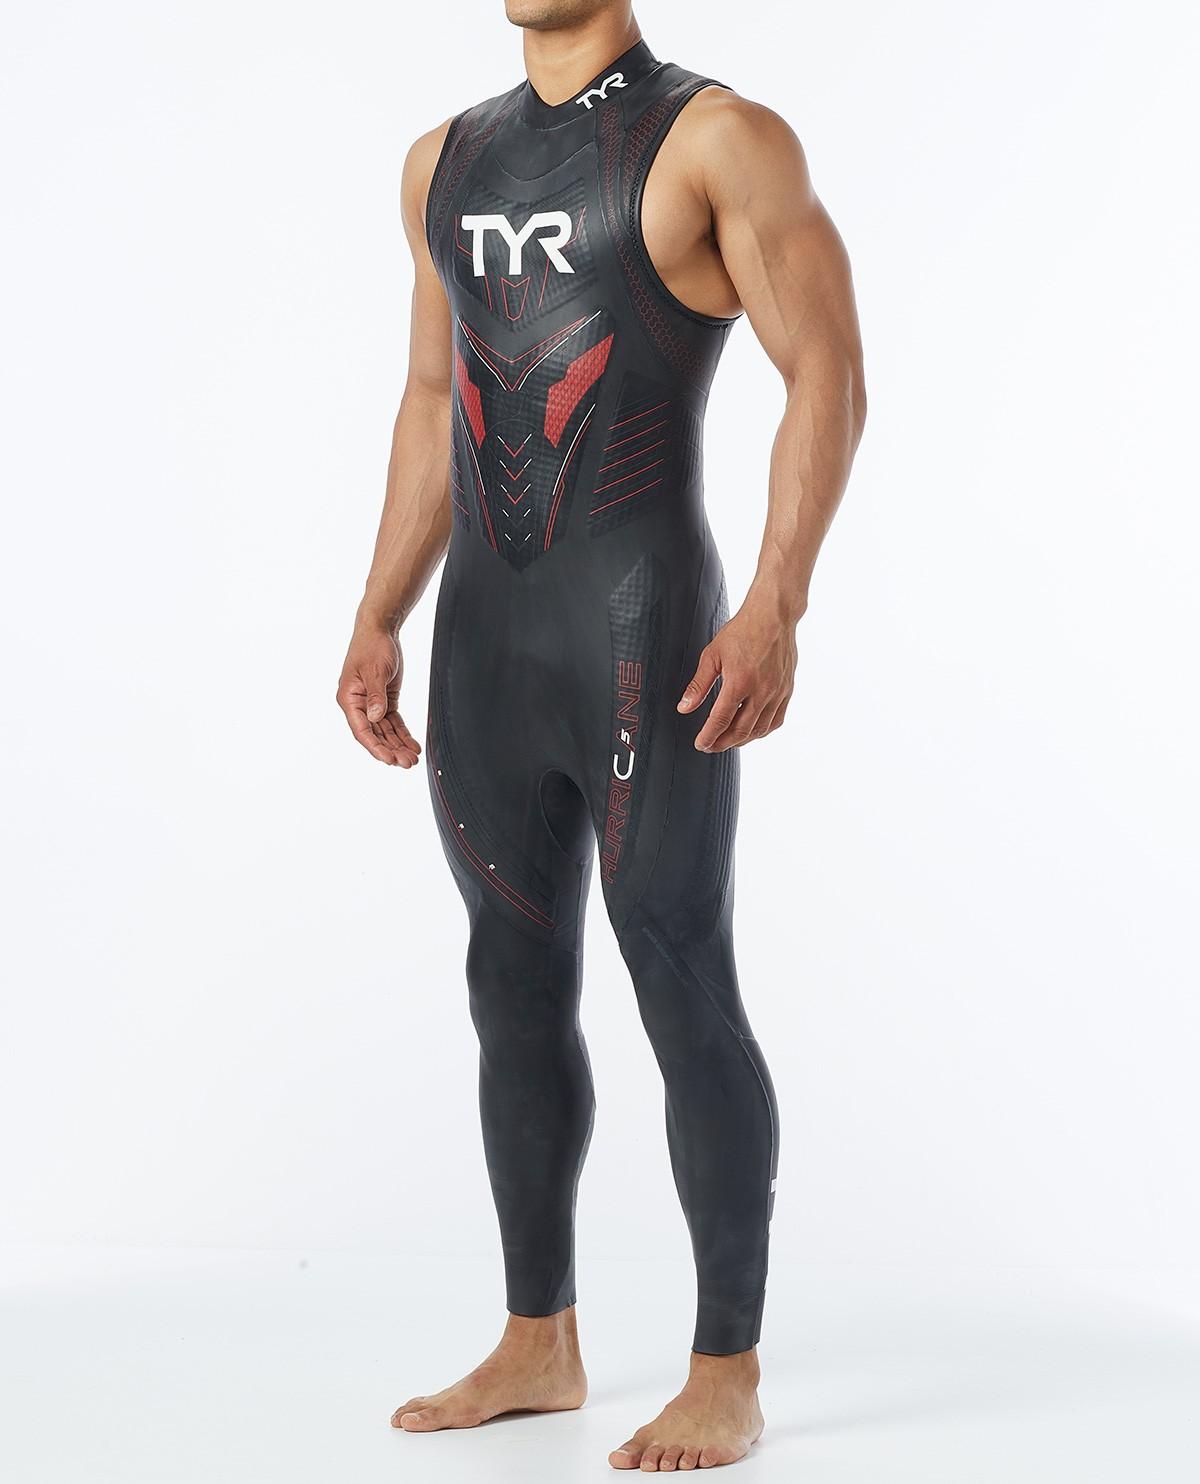 39064e23ac89c Mens Triathlon Cat 5 Sleeveless Wetsuit ...